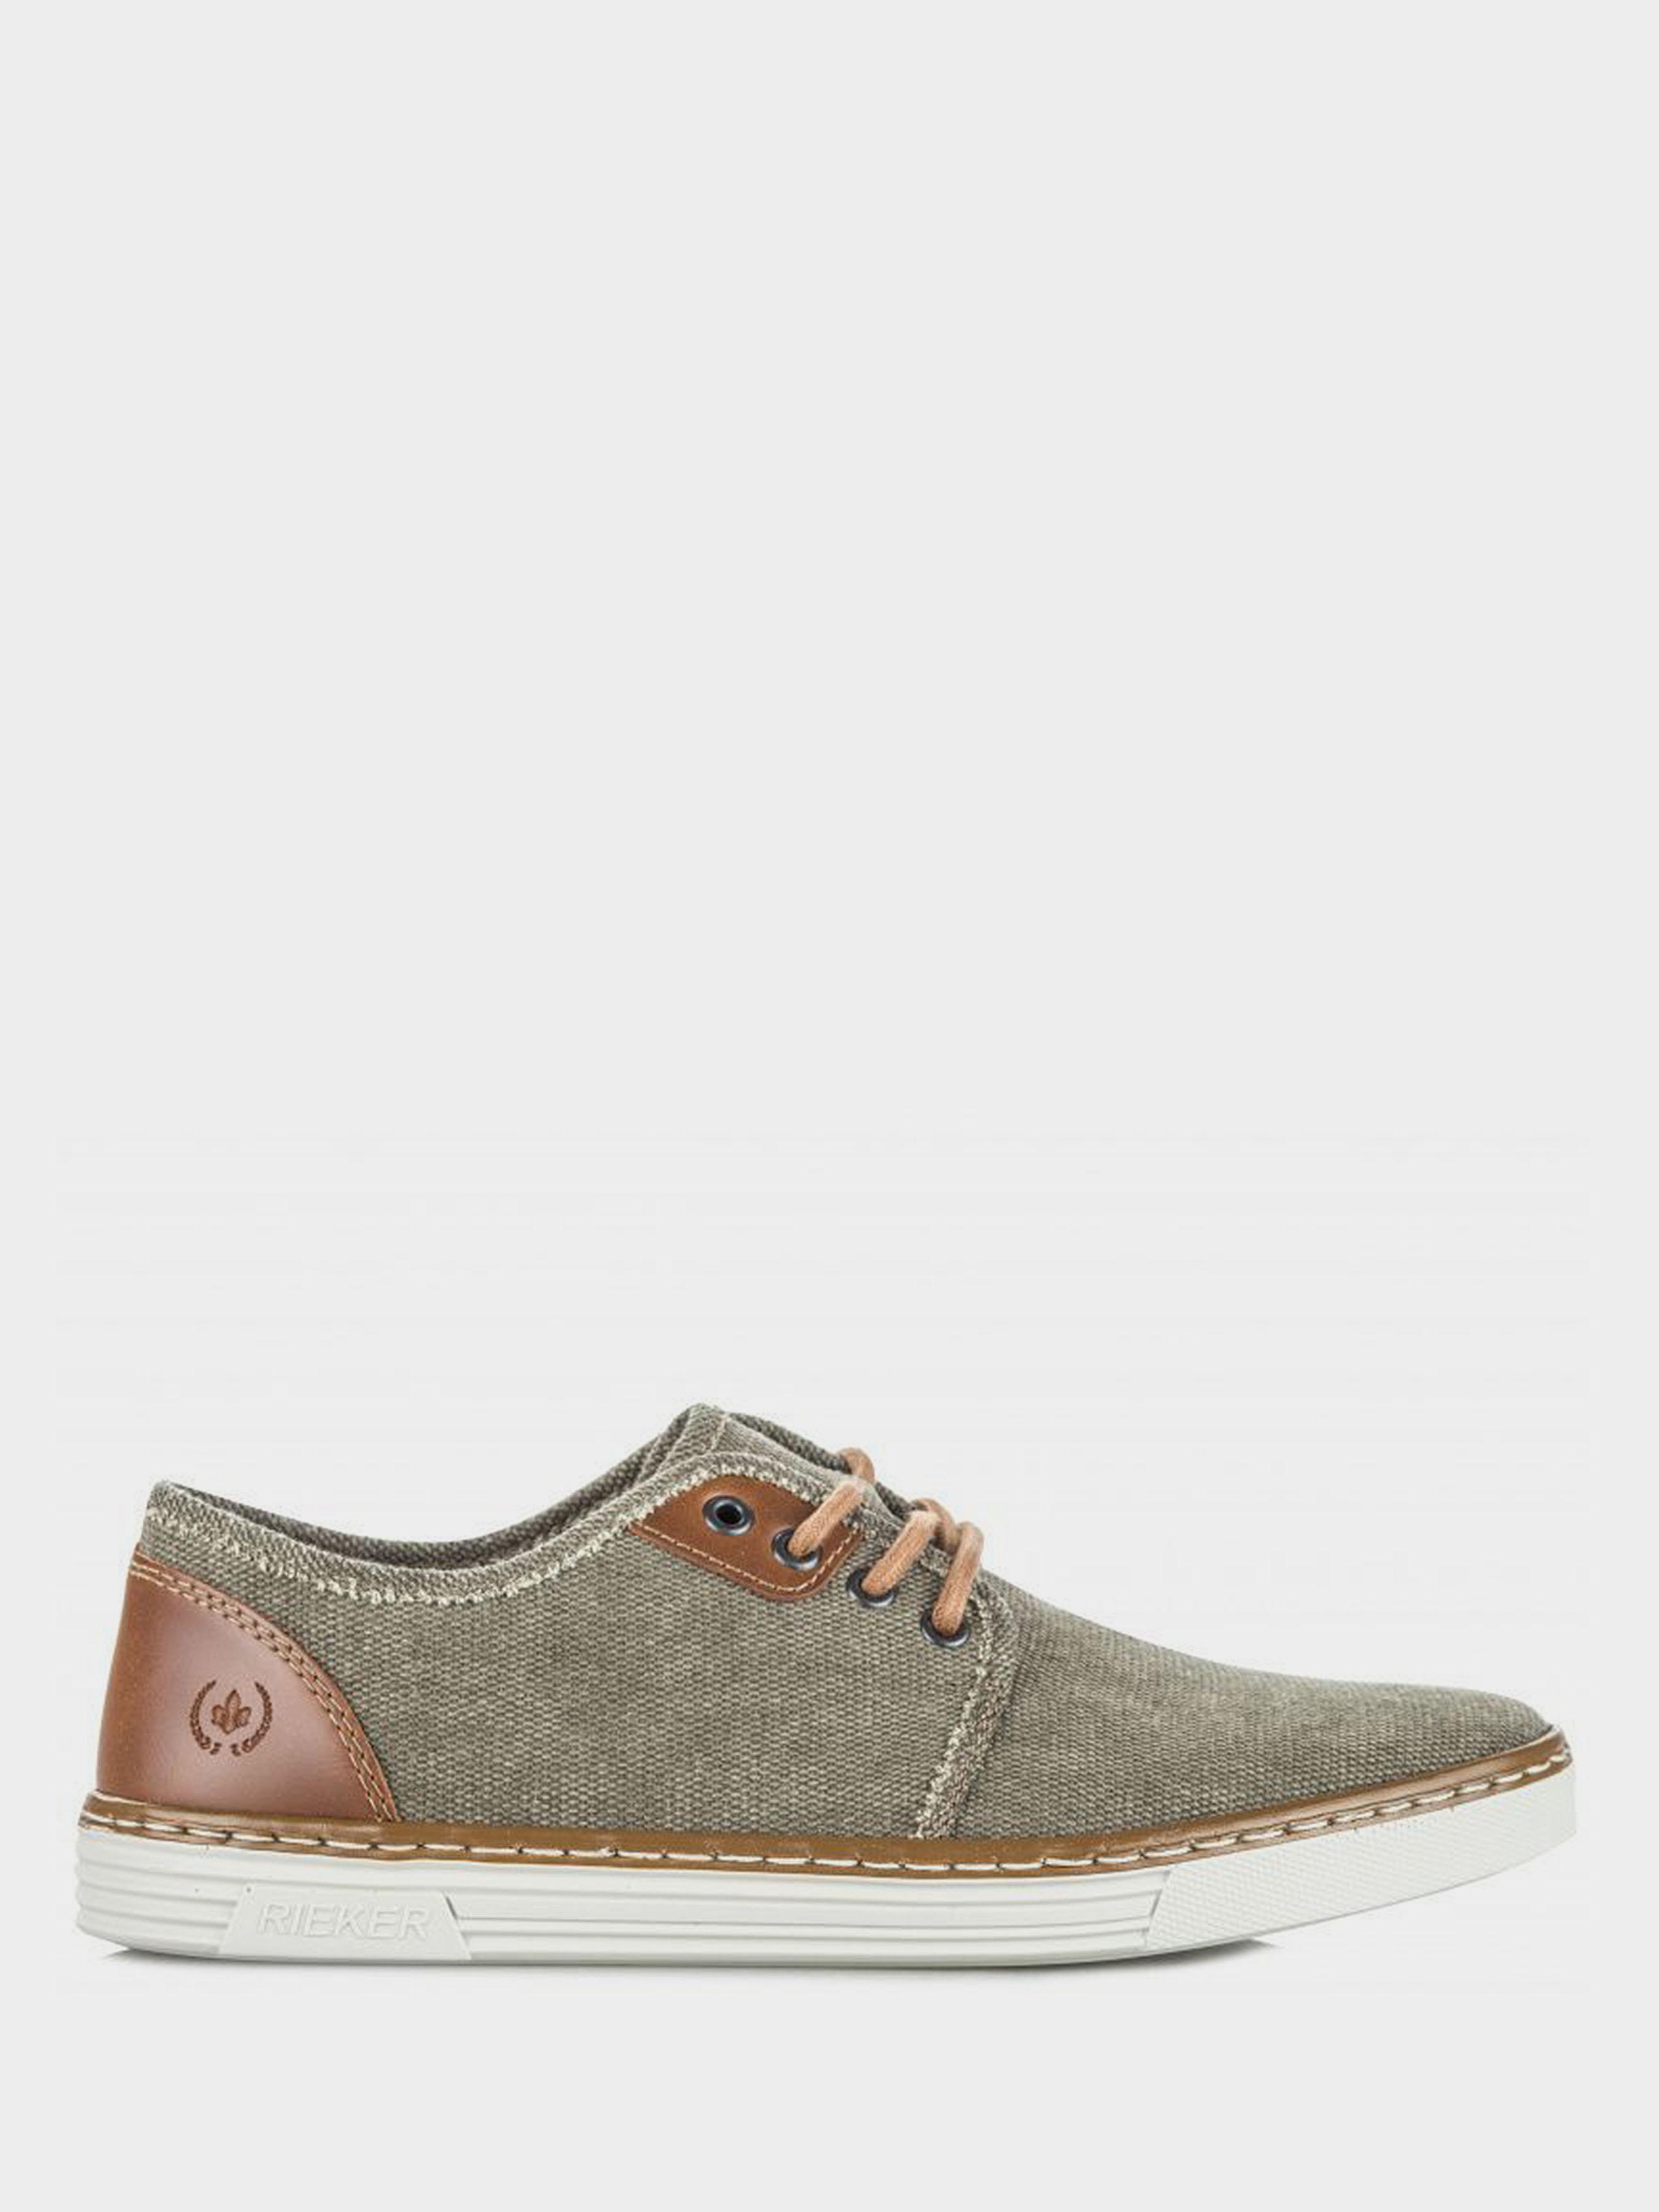 Полуботинки для мужчин RIEKER RK651 размеры обуви, 2017